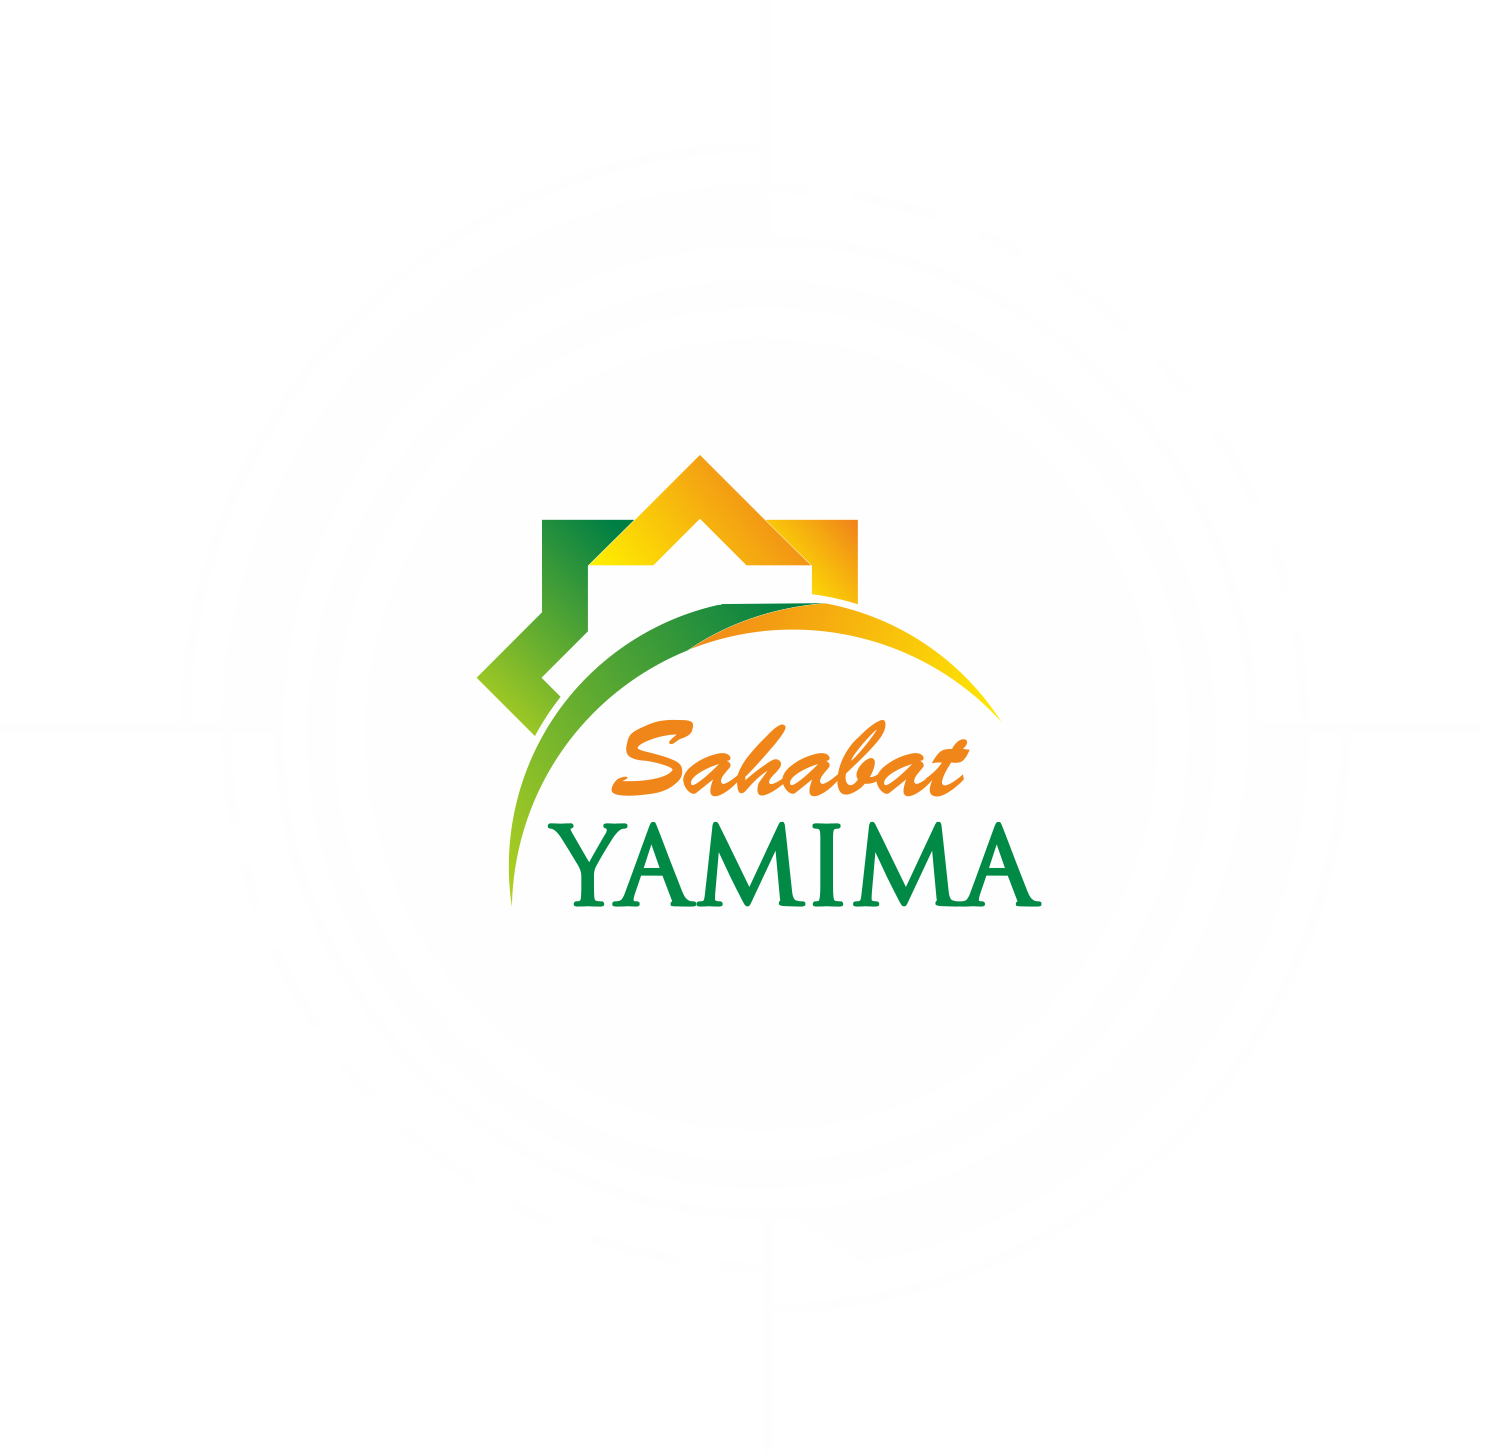 Sahabat Yamima